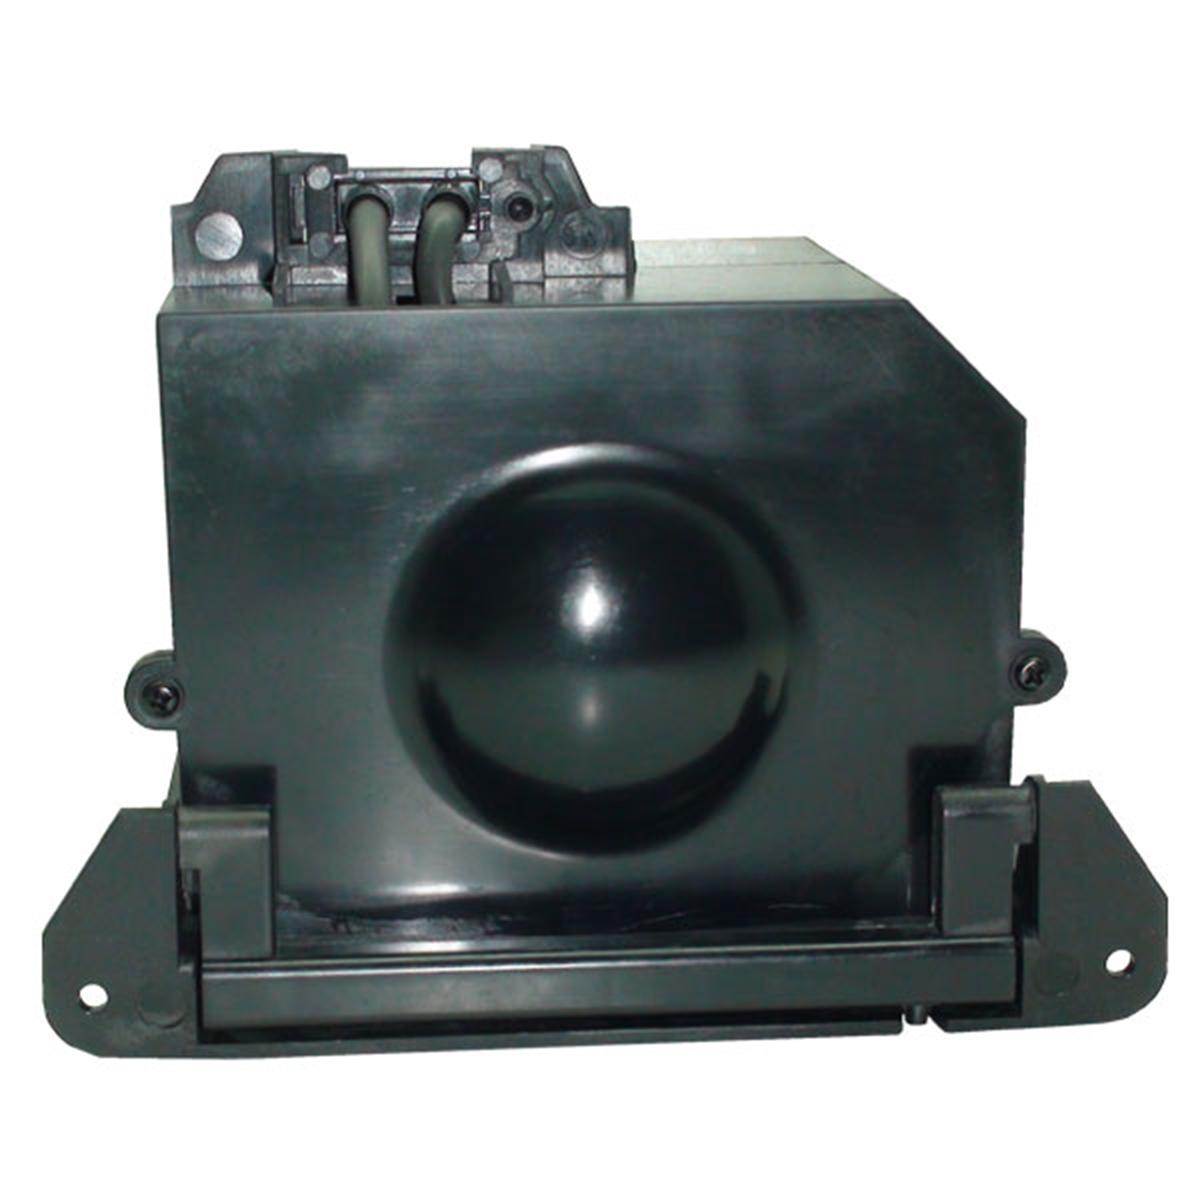 replacement bp96 00224j bulb cartridge for samsung hln617w tv lamp. Black Bedroom Furniture Sets. Home Design Ideas